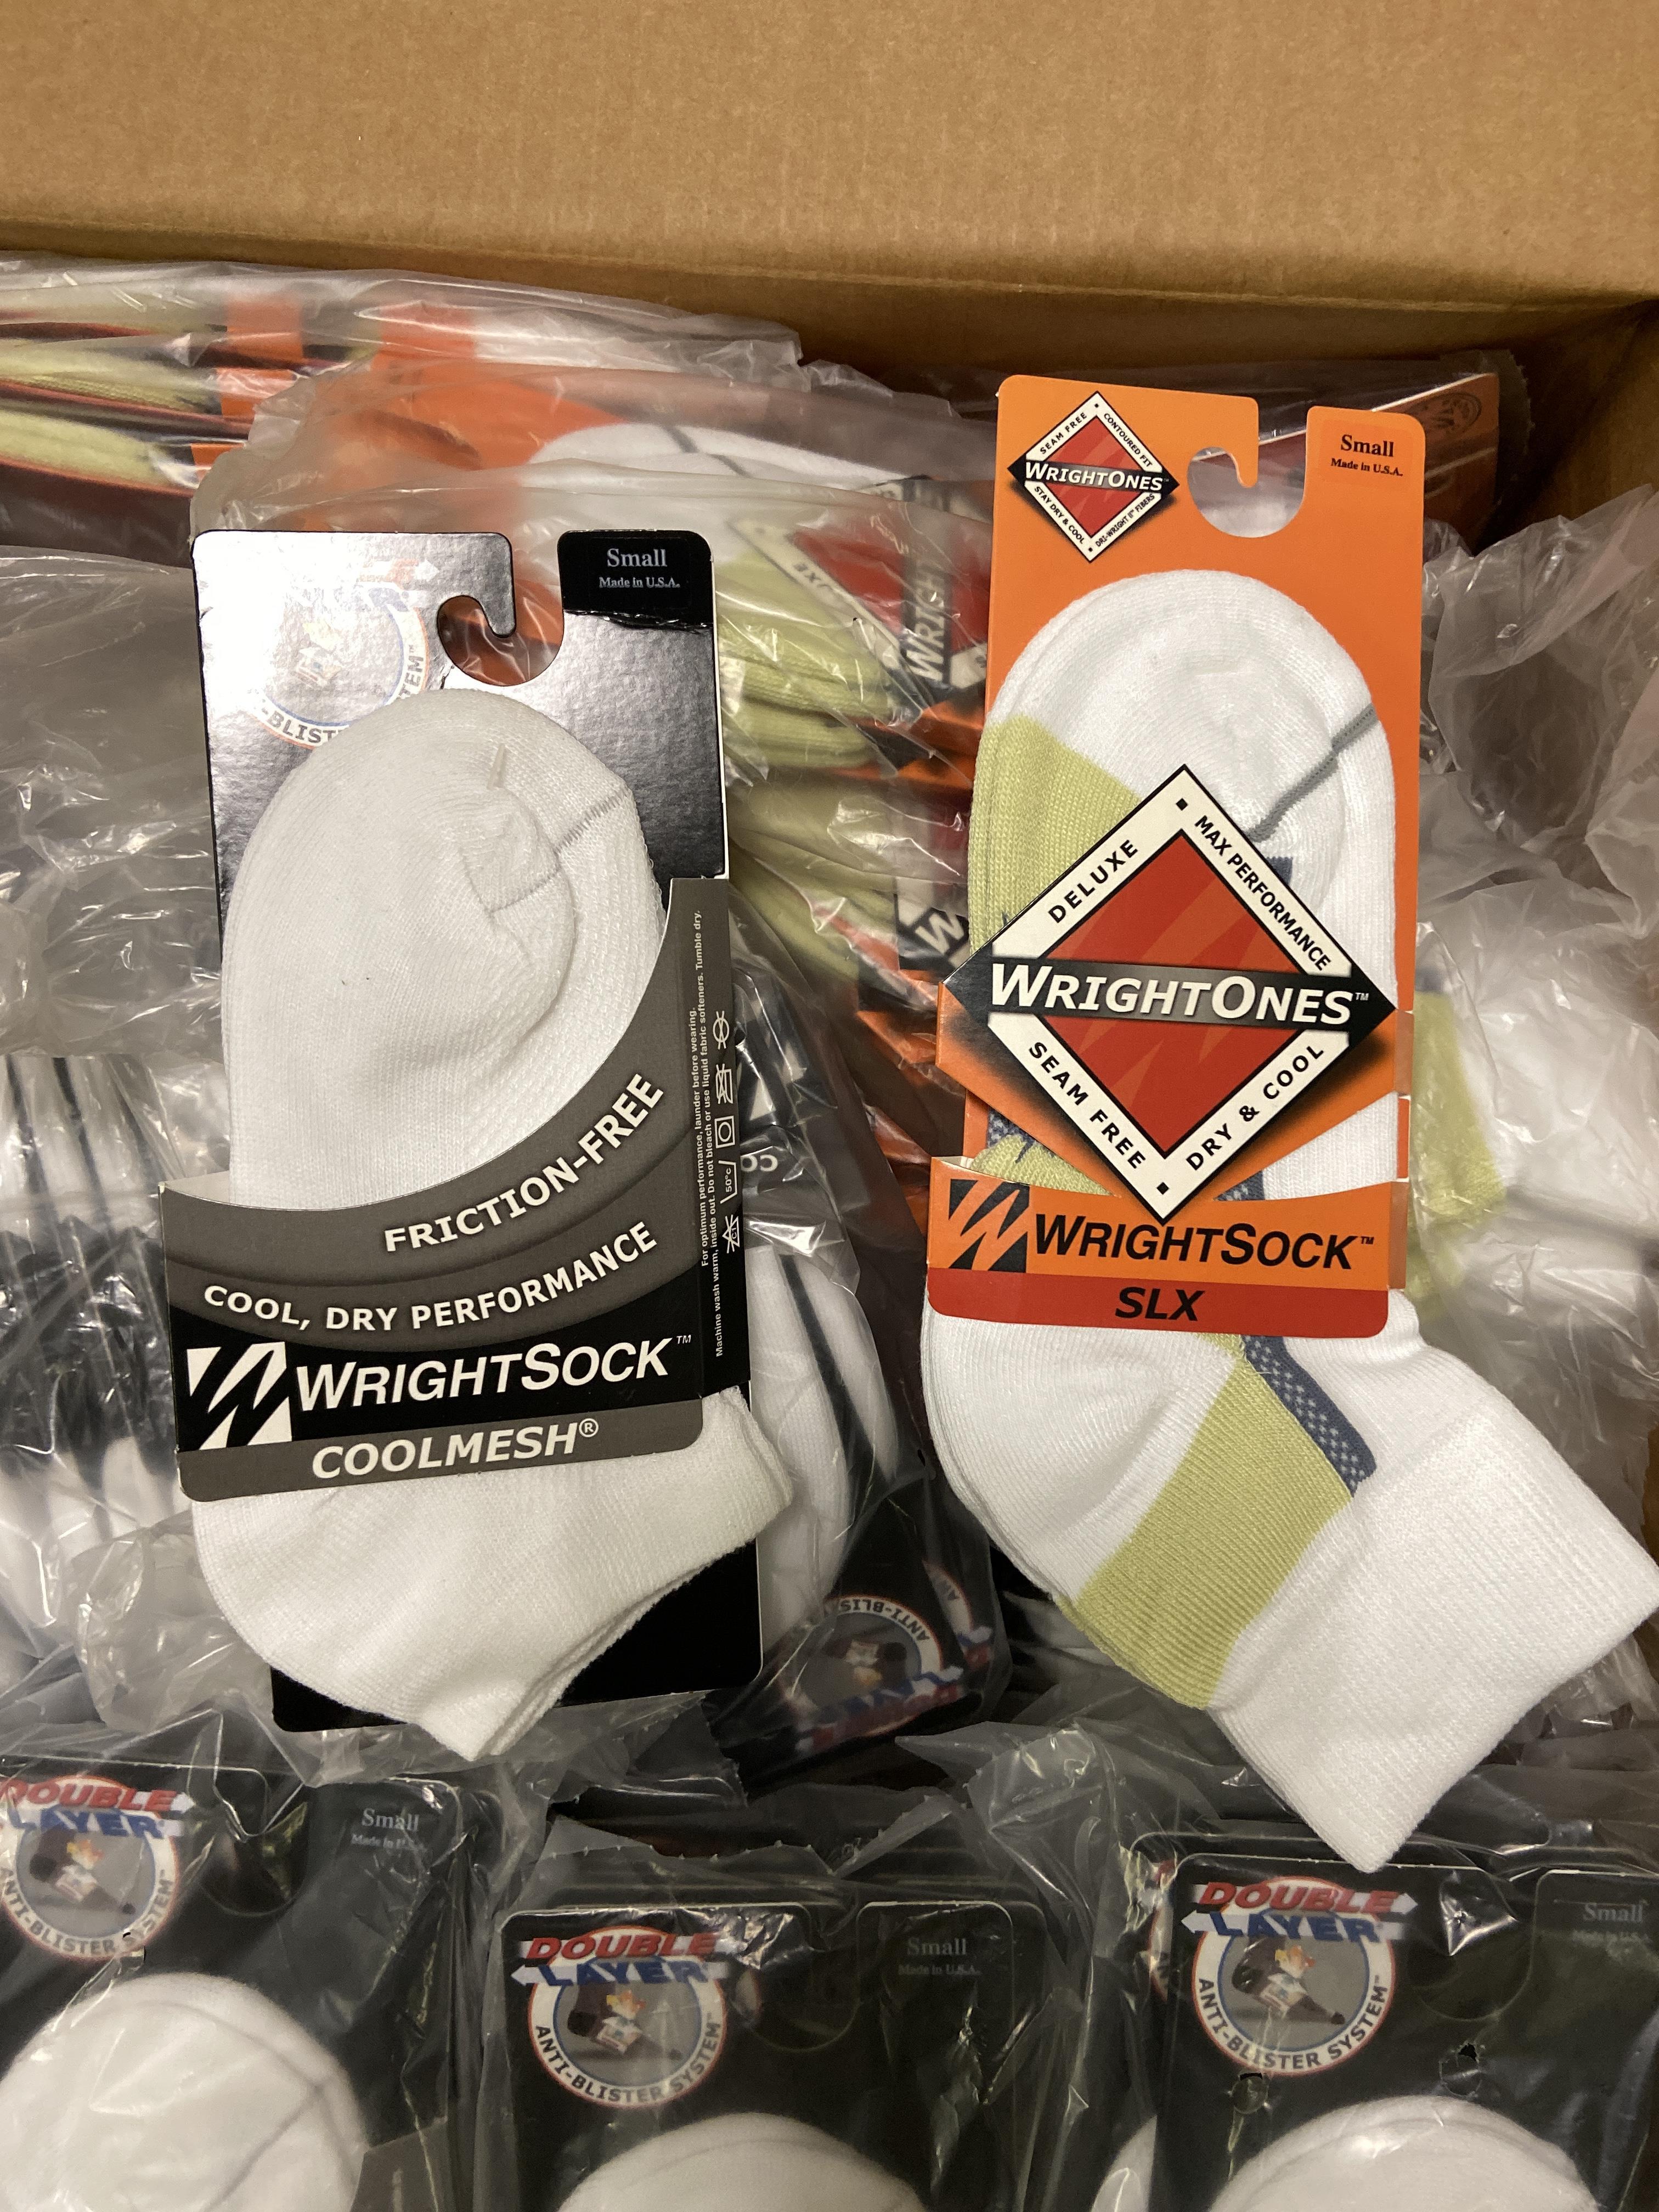 500+ packs of New Socks, Wrightsocks Coolmesh and WrightOnes SLX, Various White Styles - Image 4 of 6